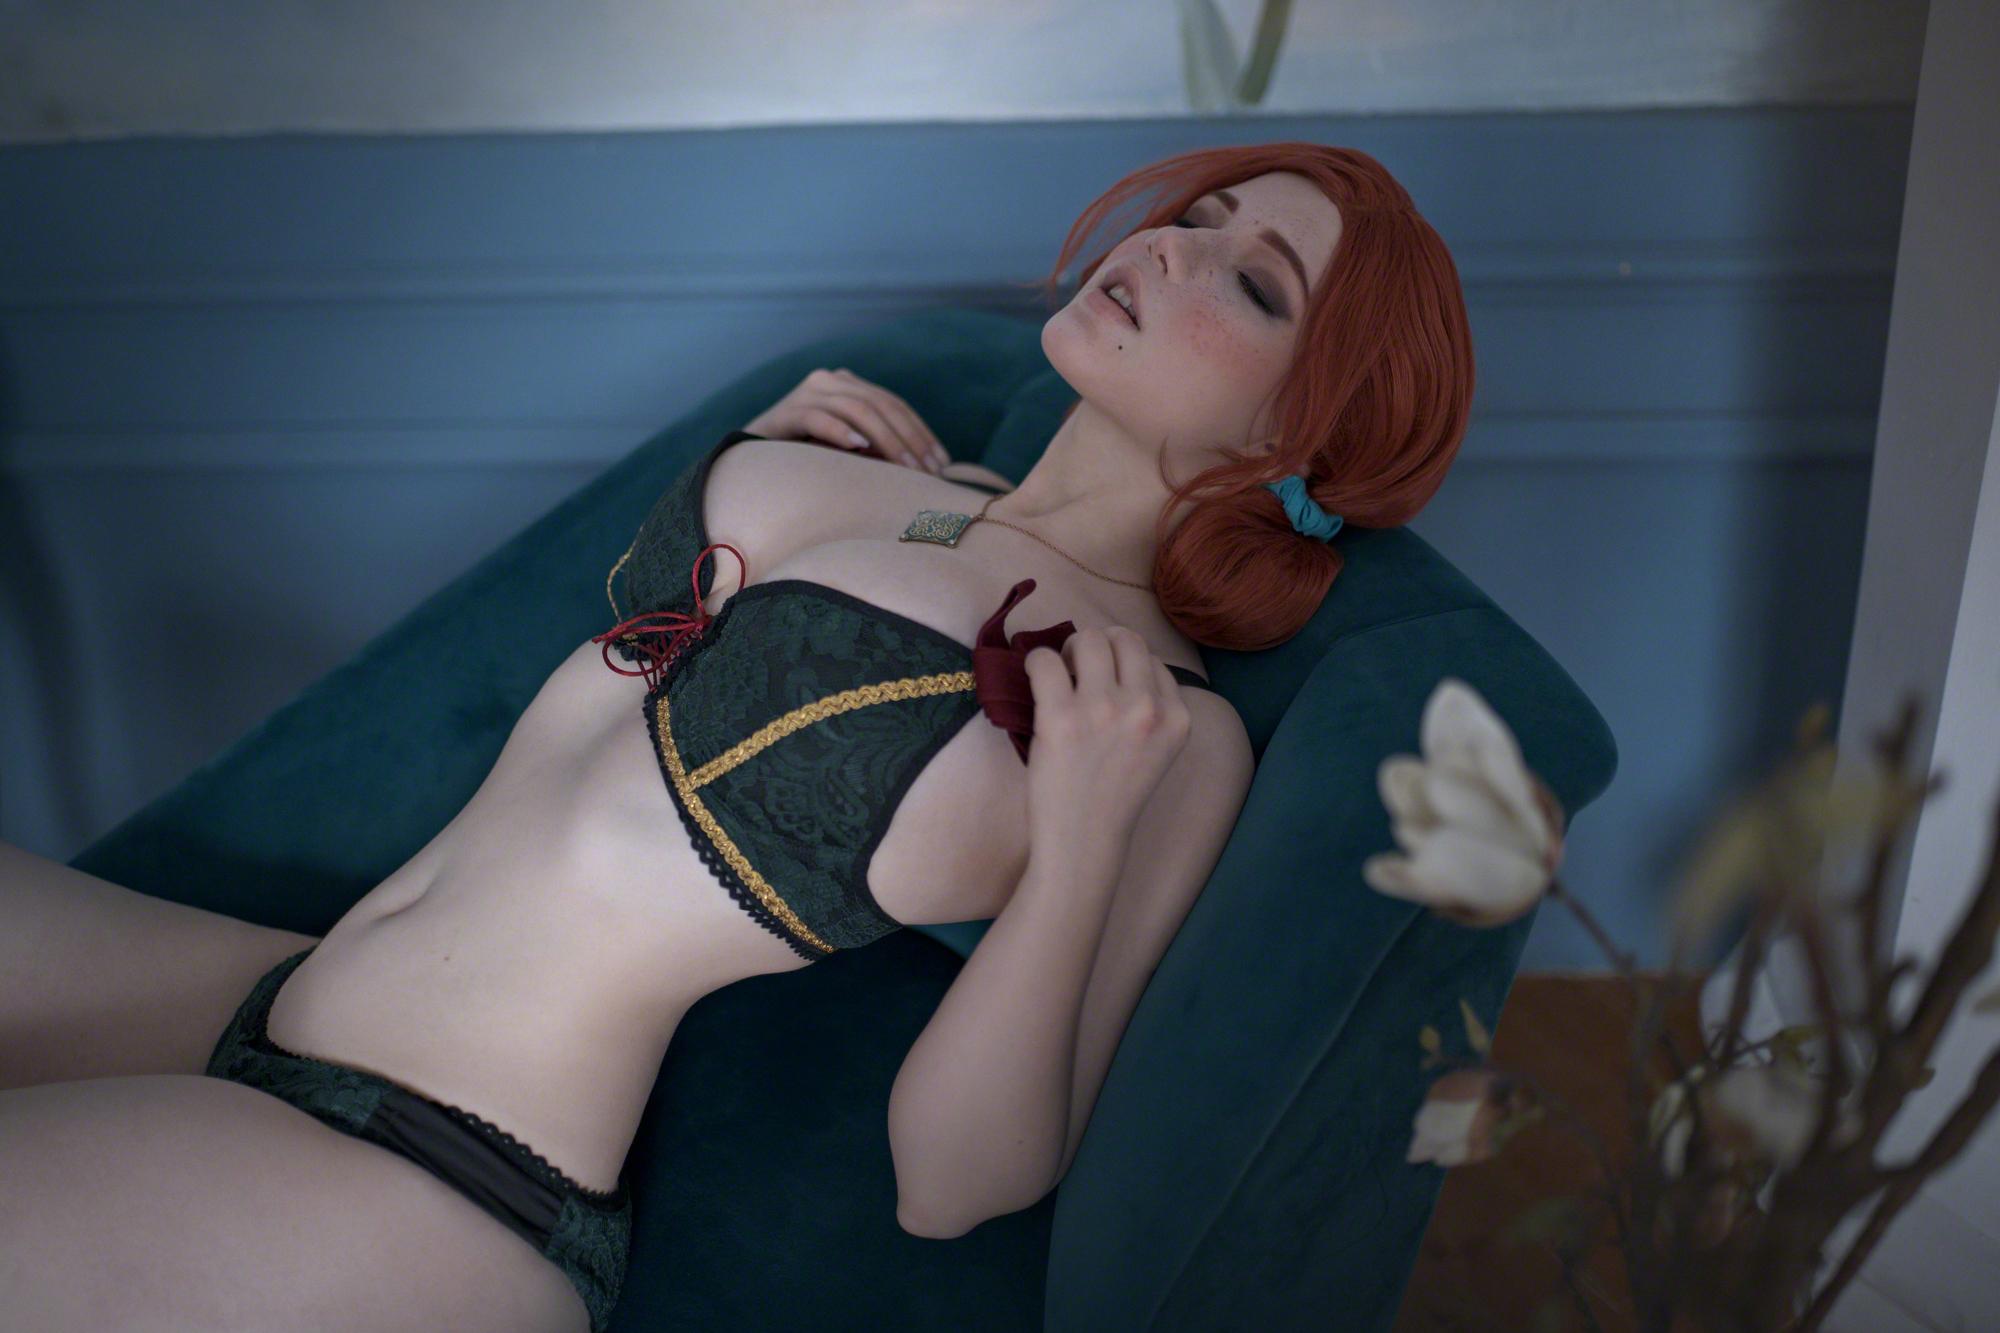 Leaked Nude Set From Lada Lyumos Patreon 0009